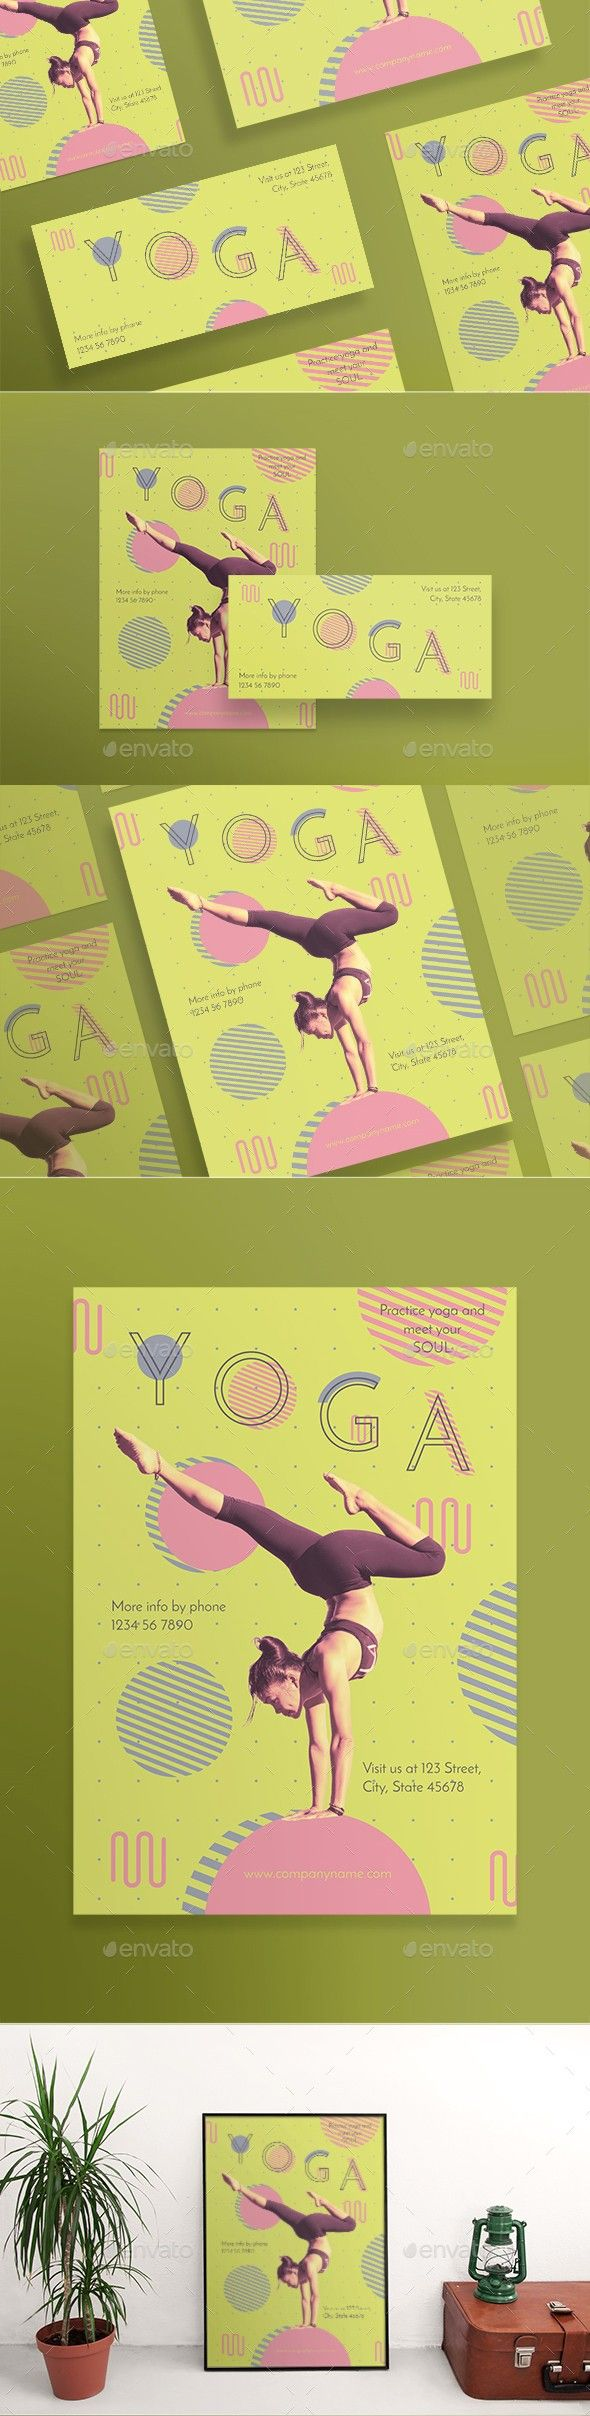 Yoga flyers pinterest flyer layout and flyer template stopboris Gallery